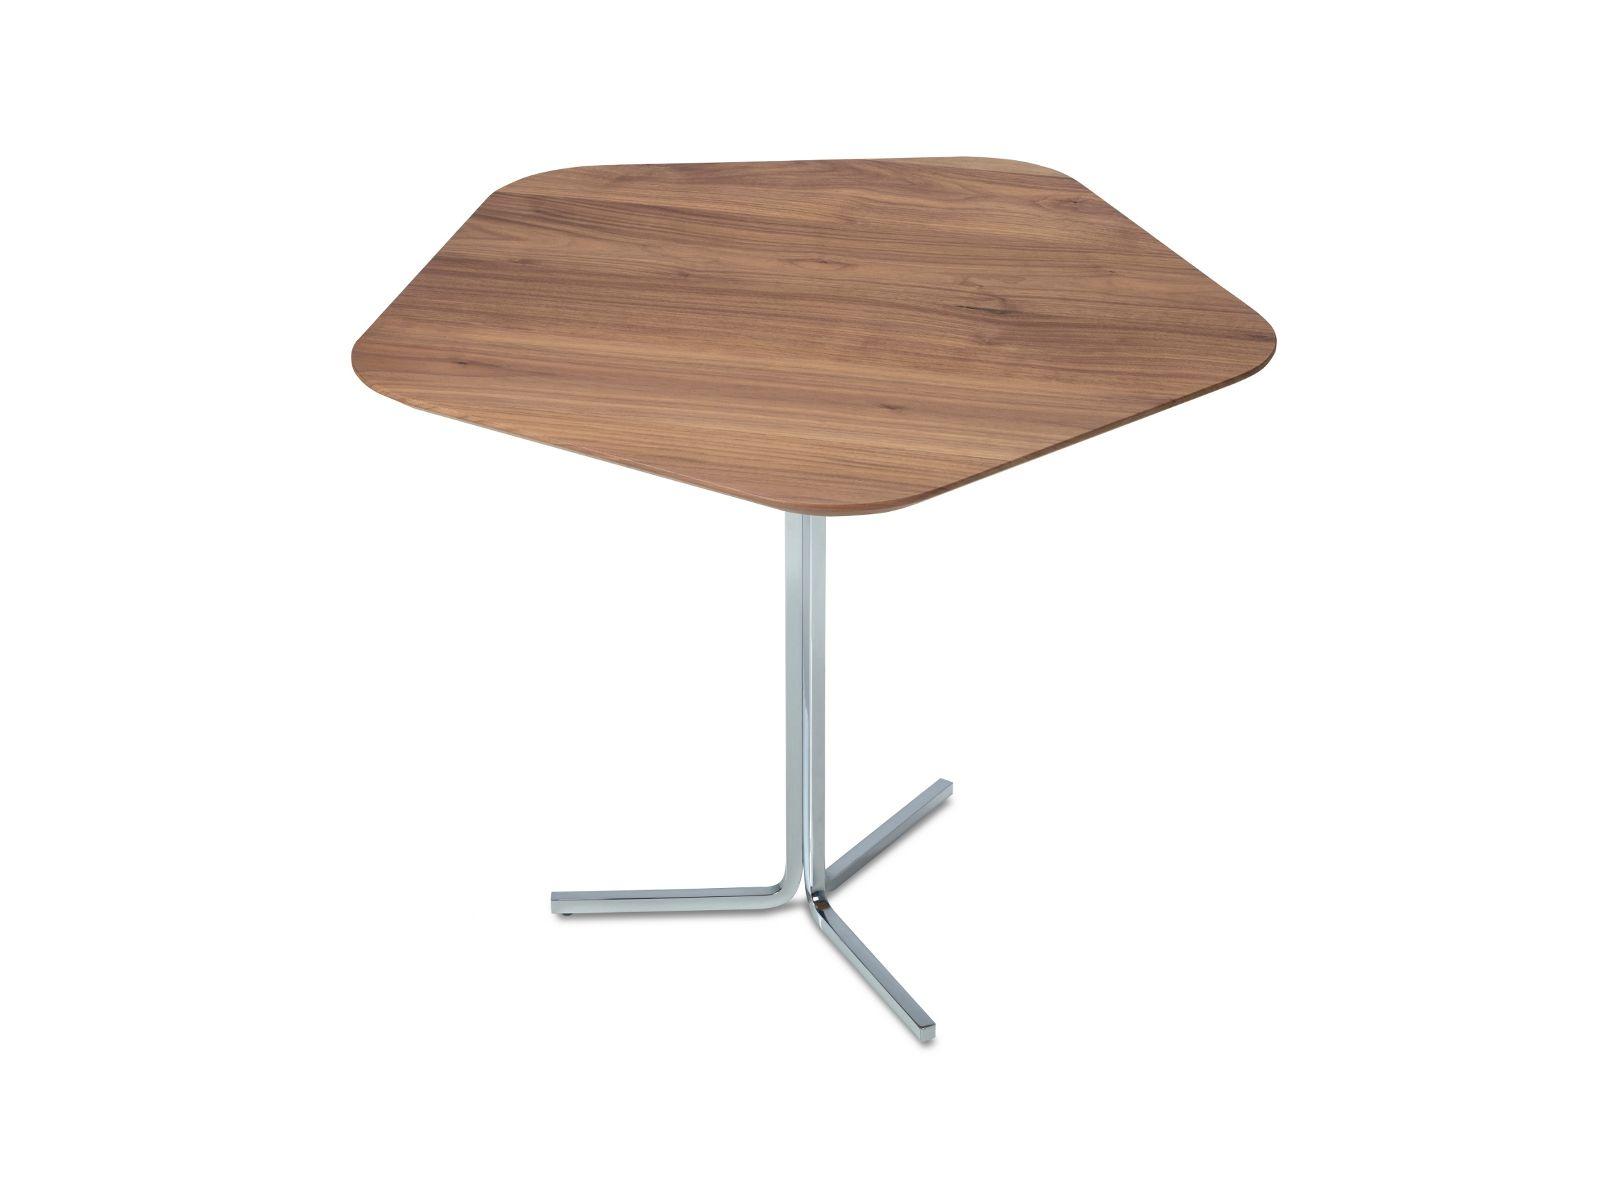 PENTAGONO Side Table Pentagono Collection By Jori Design